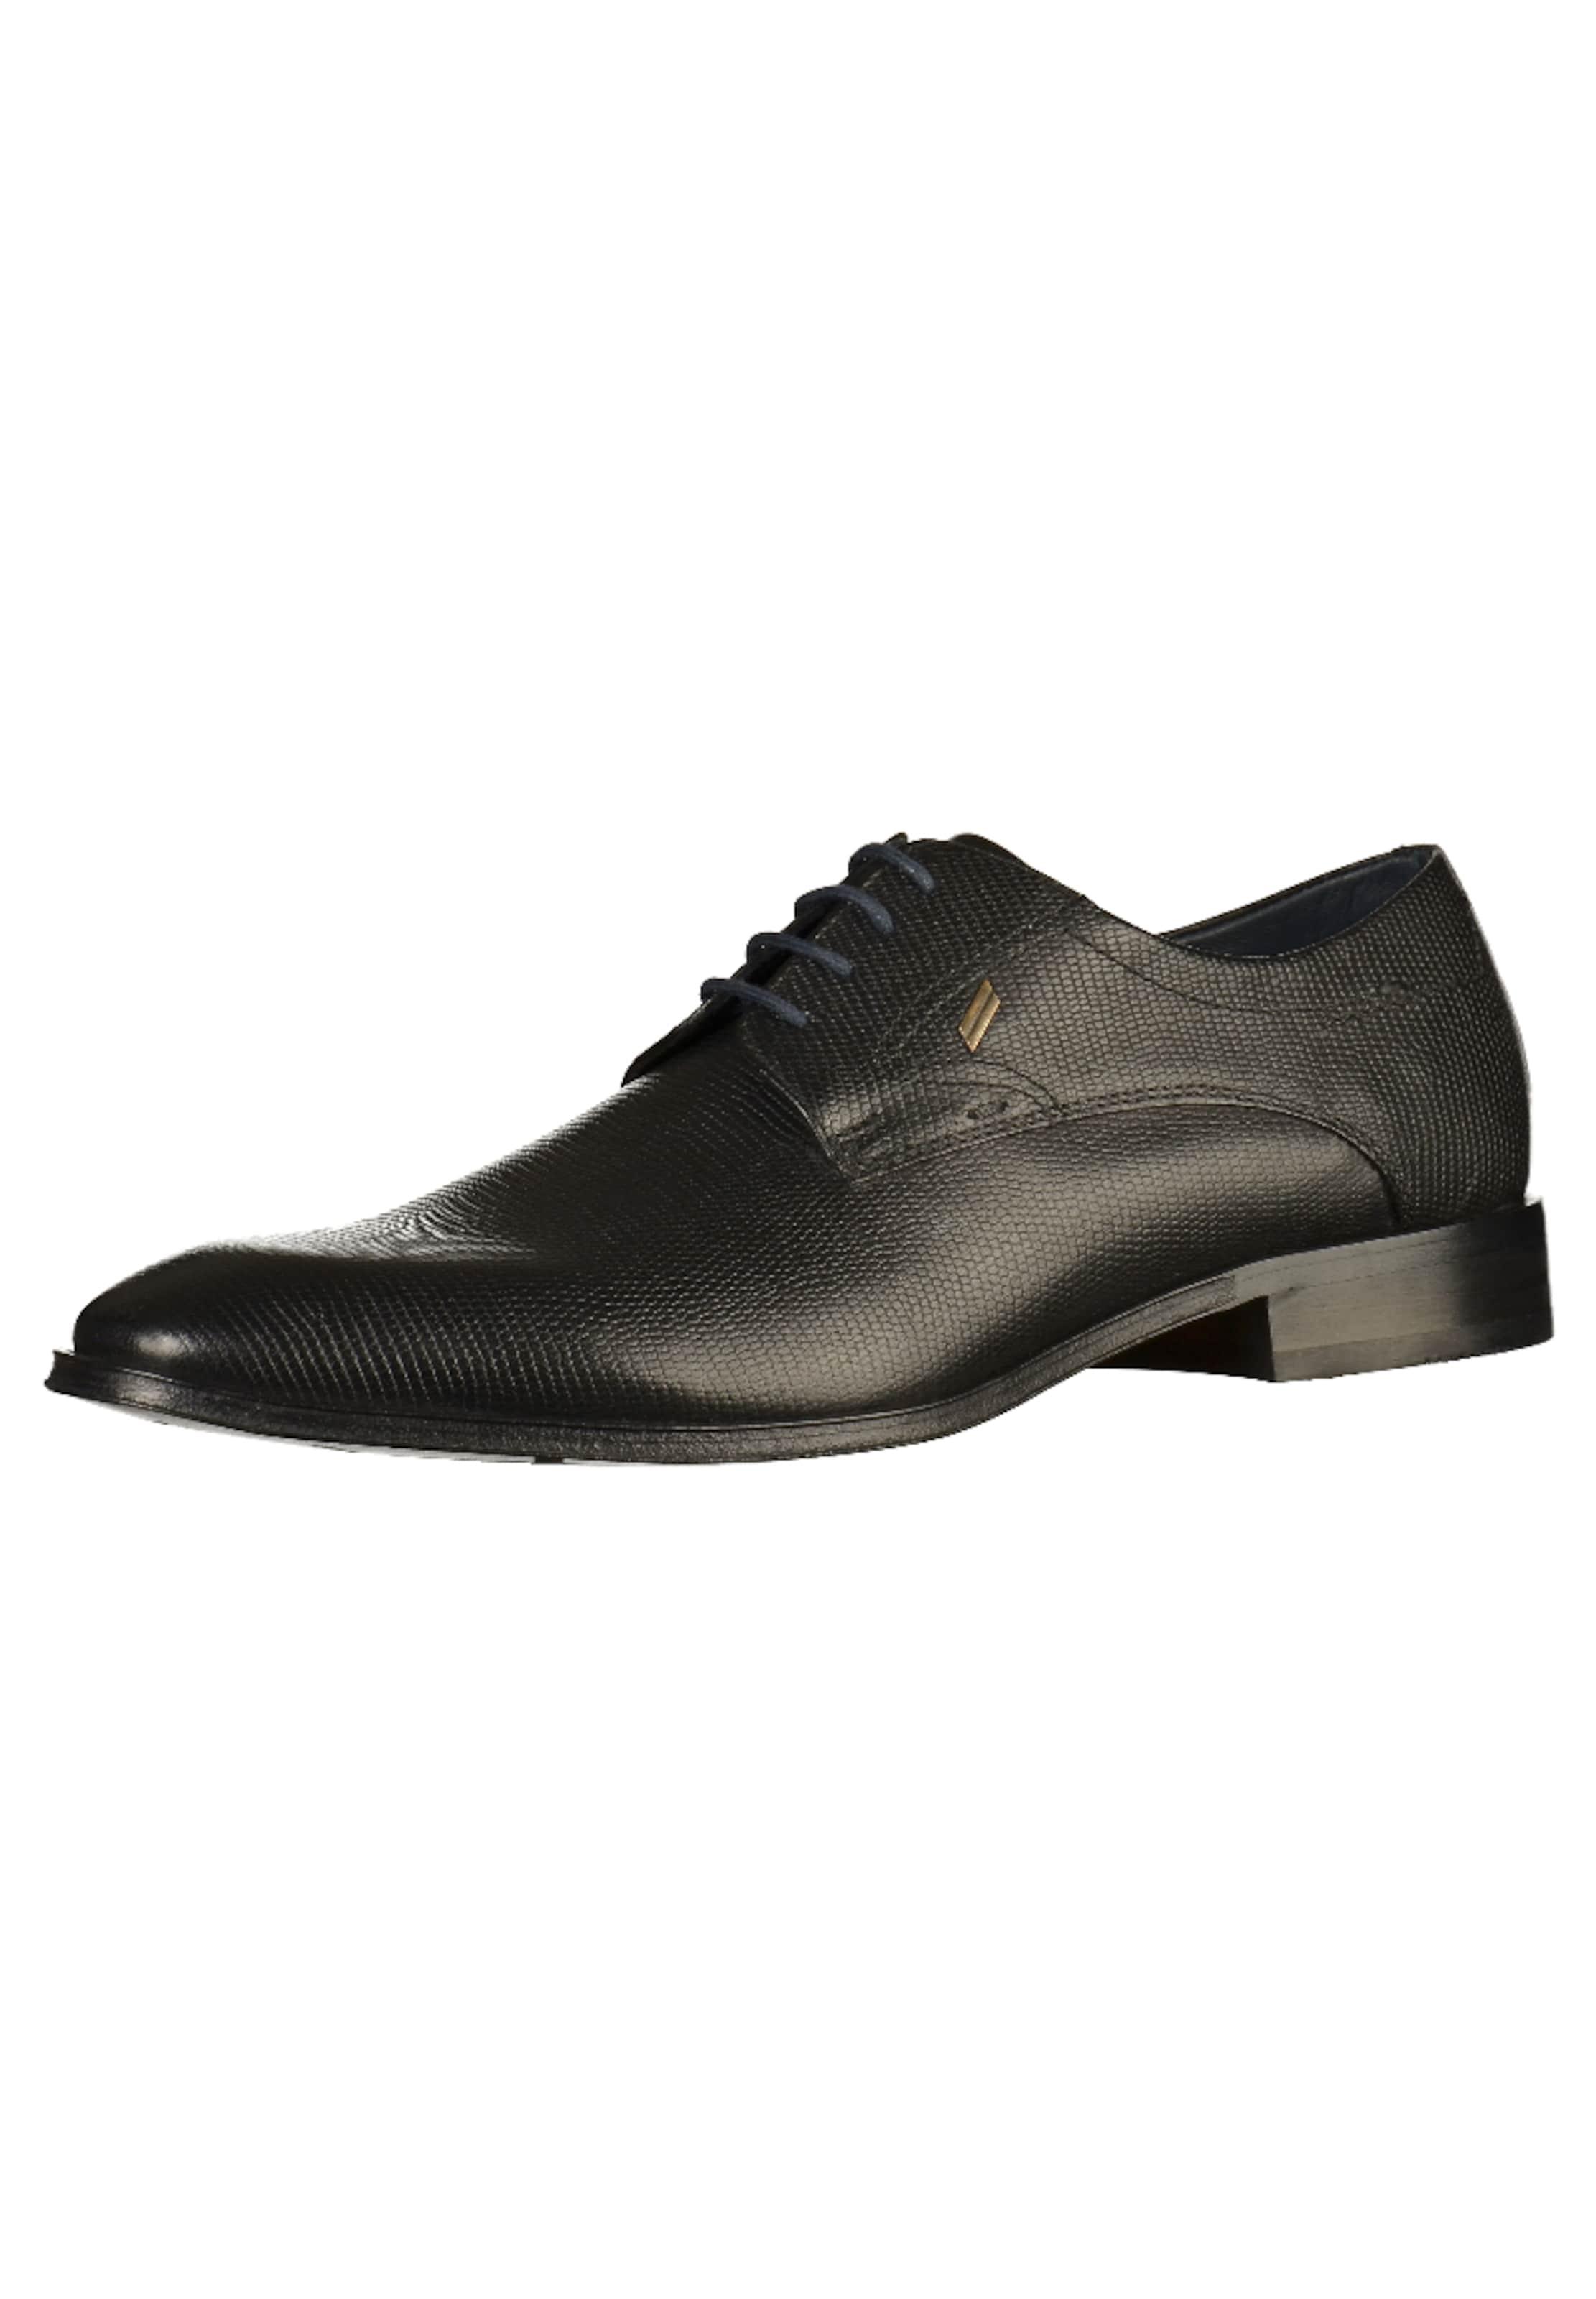 DANIEL HECHTER Businessschuhe Verschleißfeste billige Schuhe